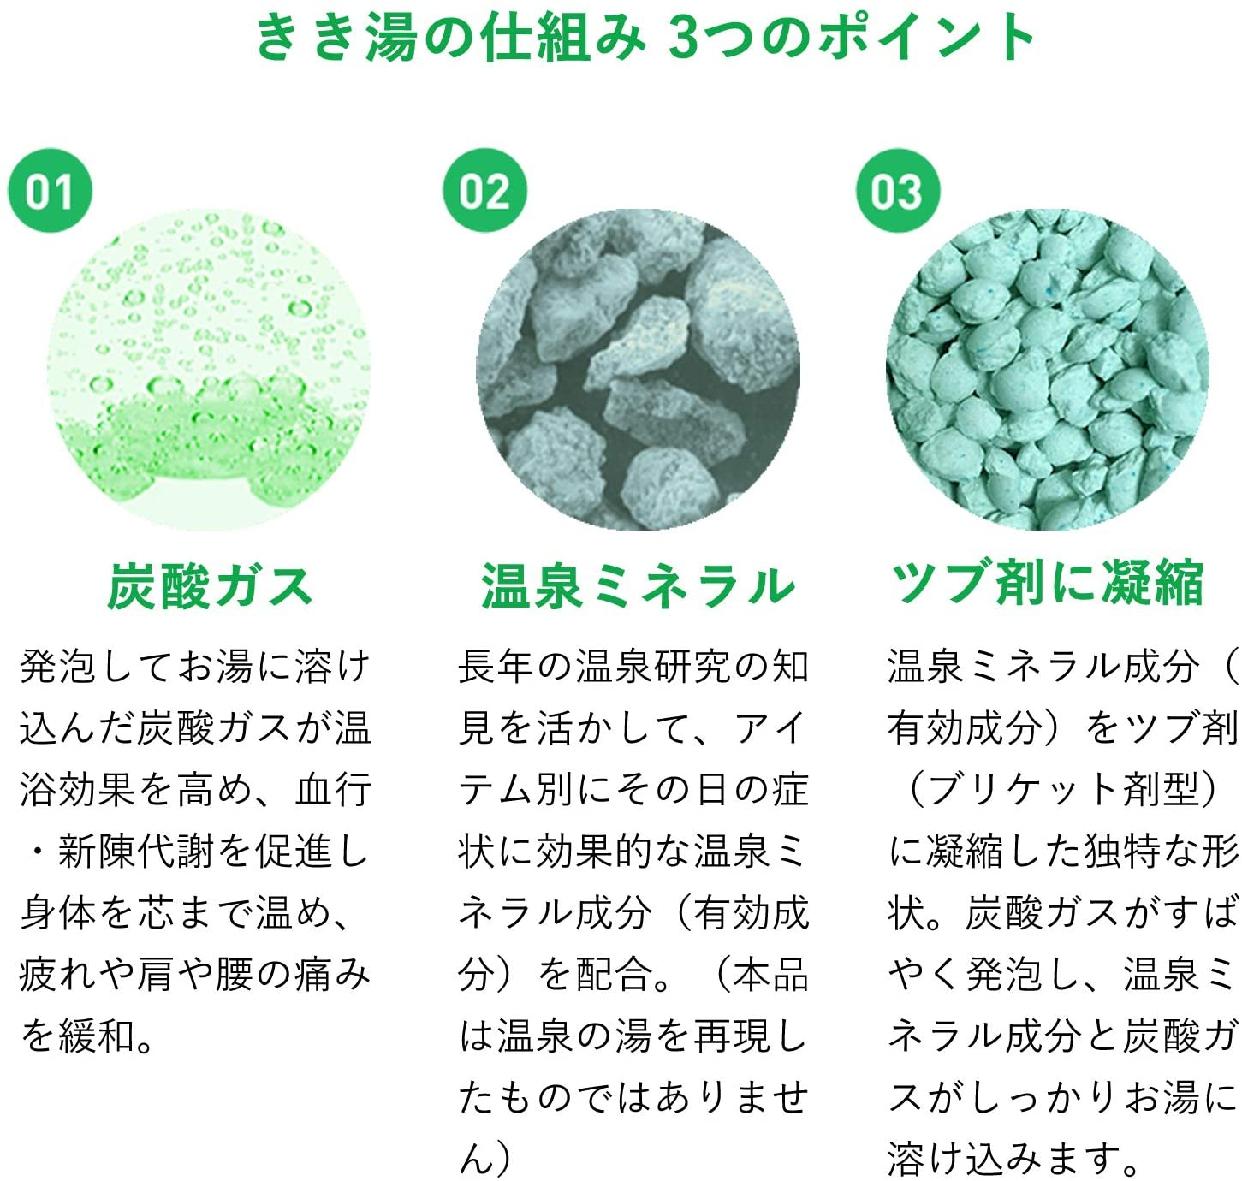 BATHCLIN(バスクリン) きき湯 マグネシウム炭酸湯の商品画像2